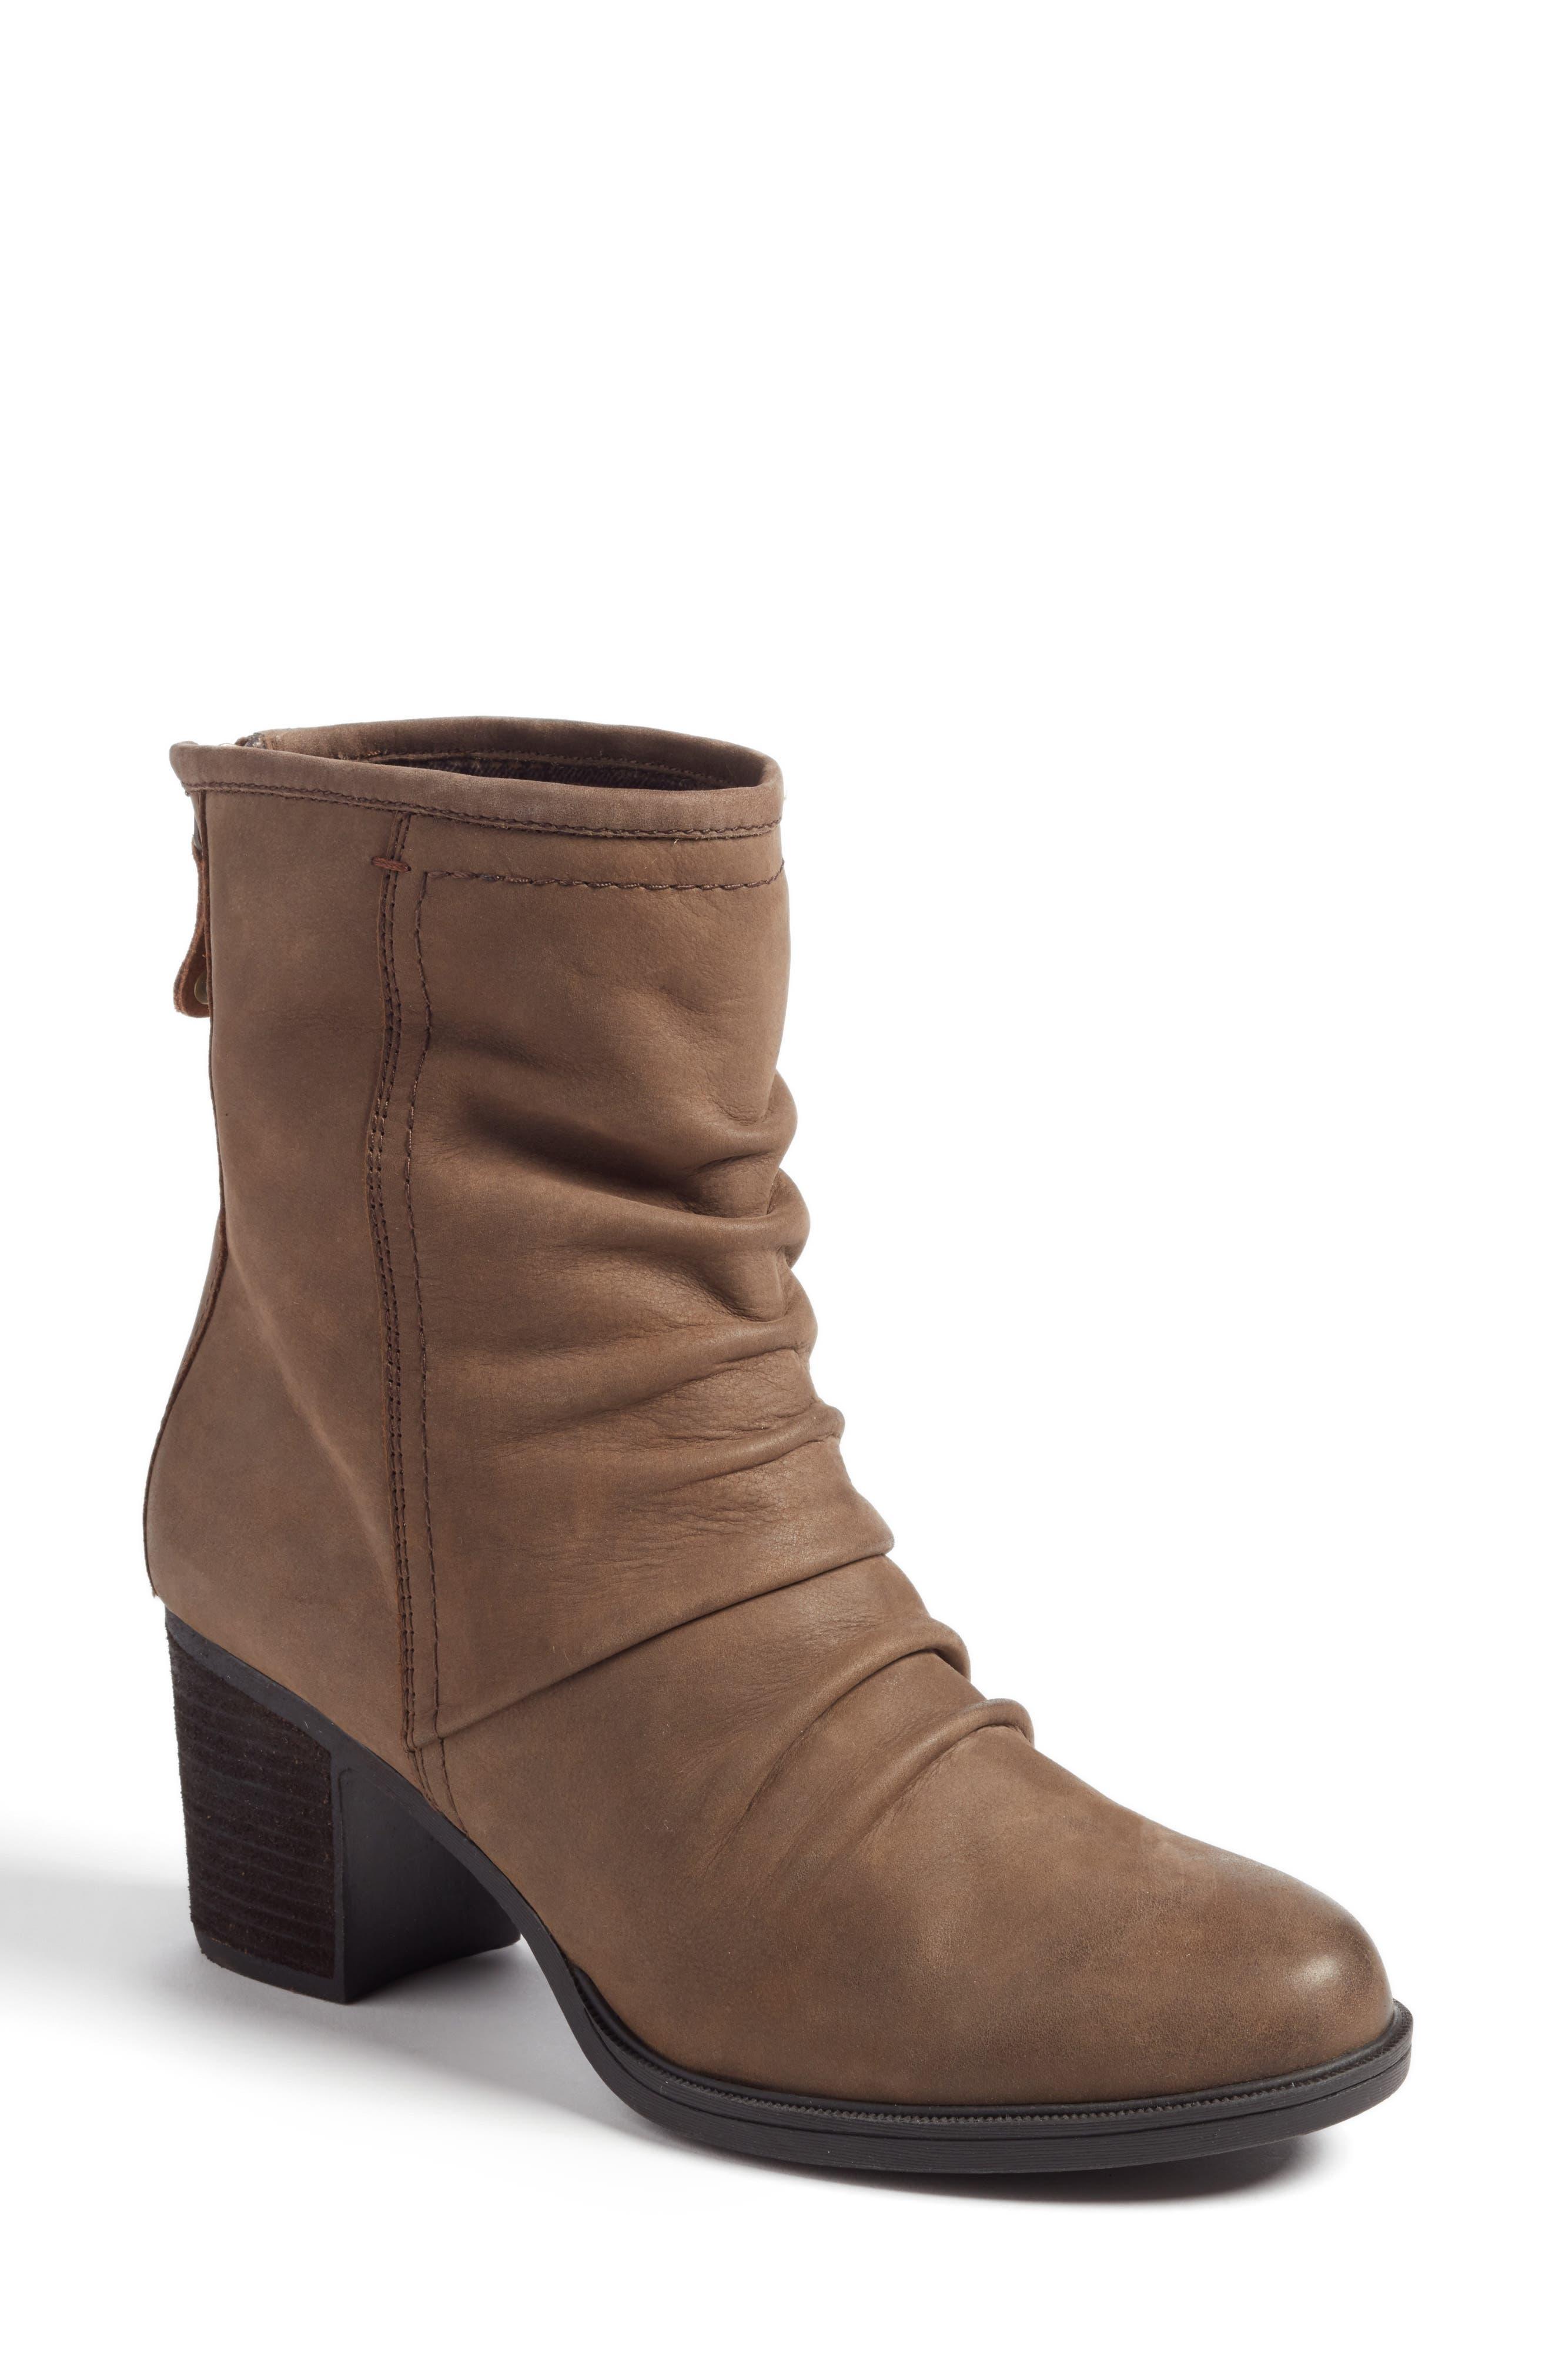 Natashya Slouchy Block Heel Bootie,                         Main,                         color, Stone Nubuck